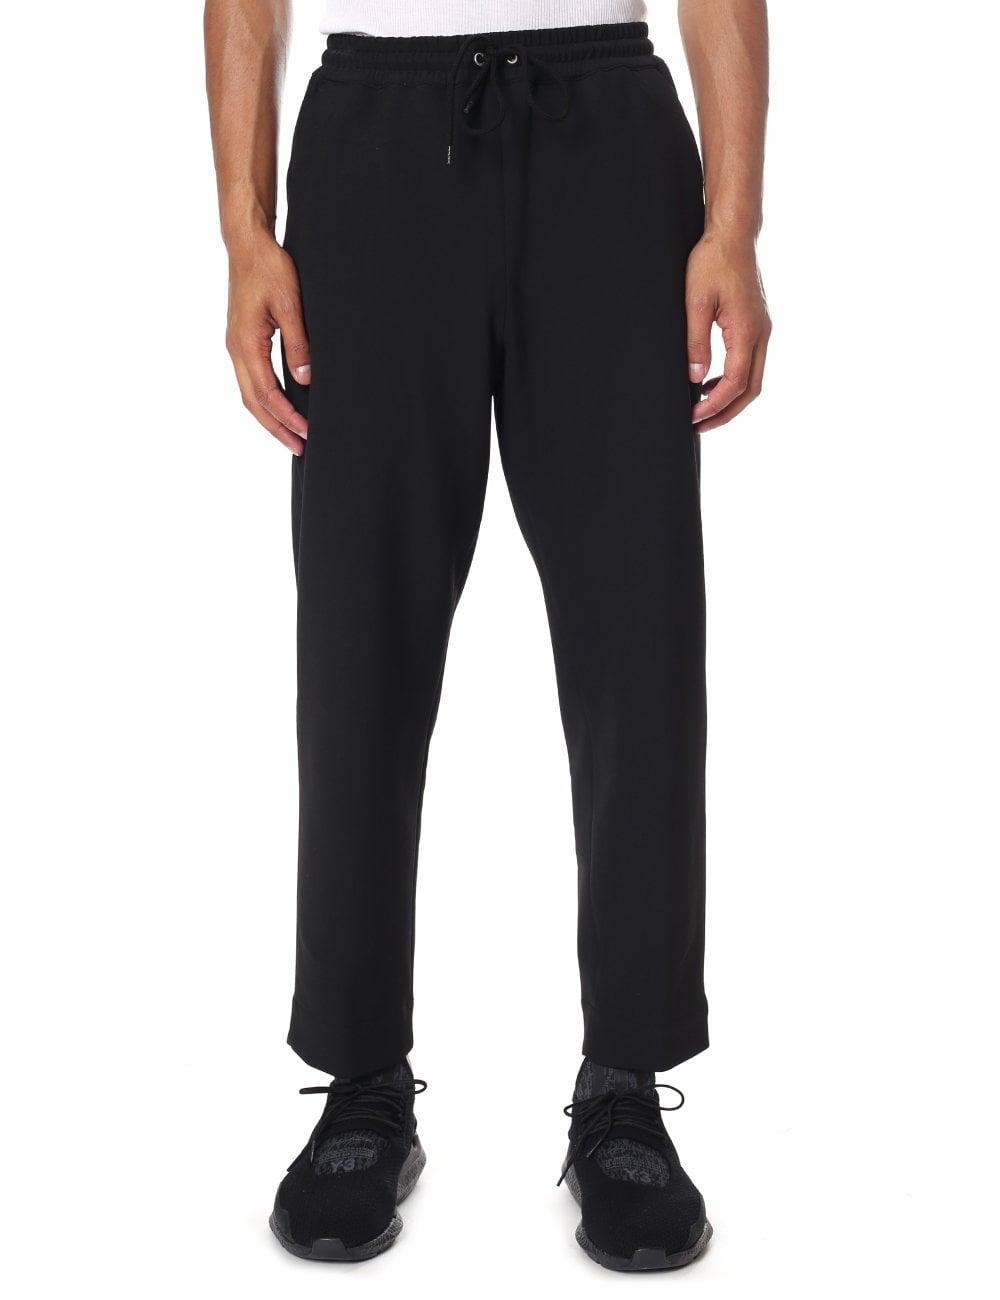 7cec2a6728e1 Kenzo Men s Cropped Tie Waist Sweat Pants